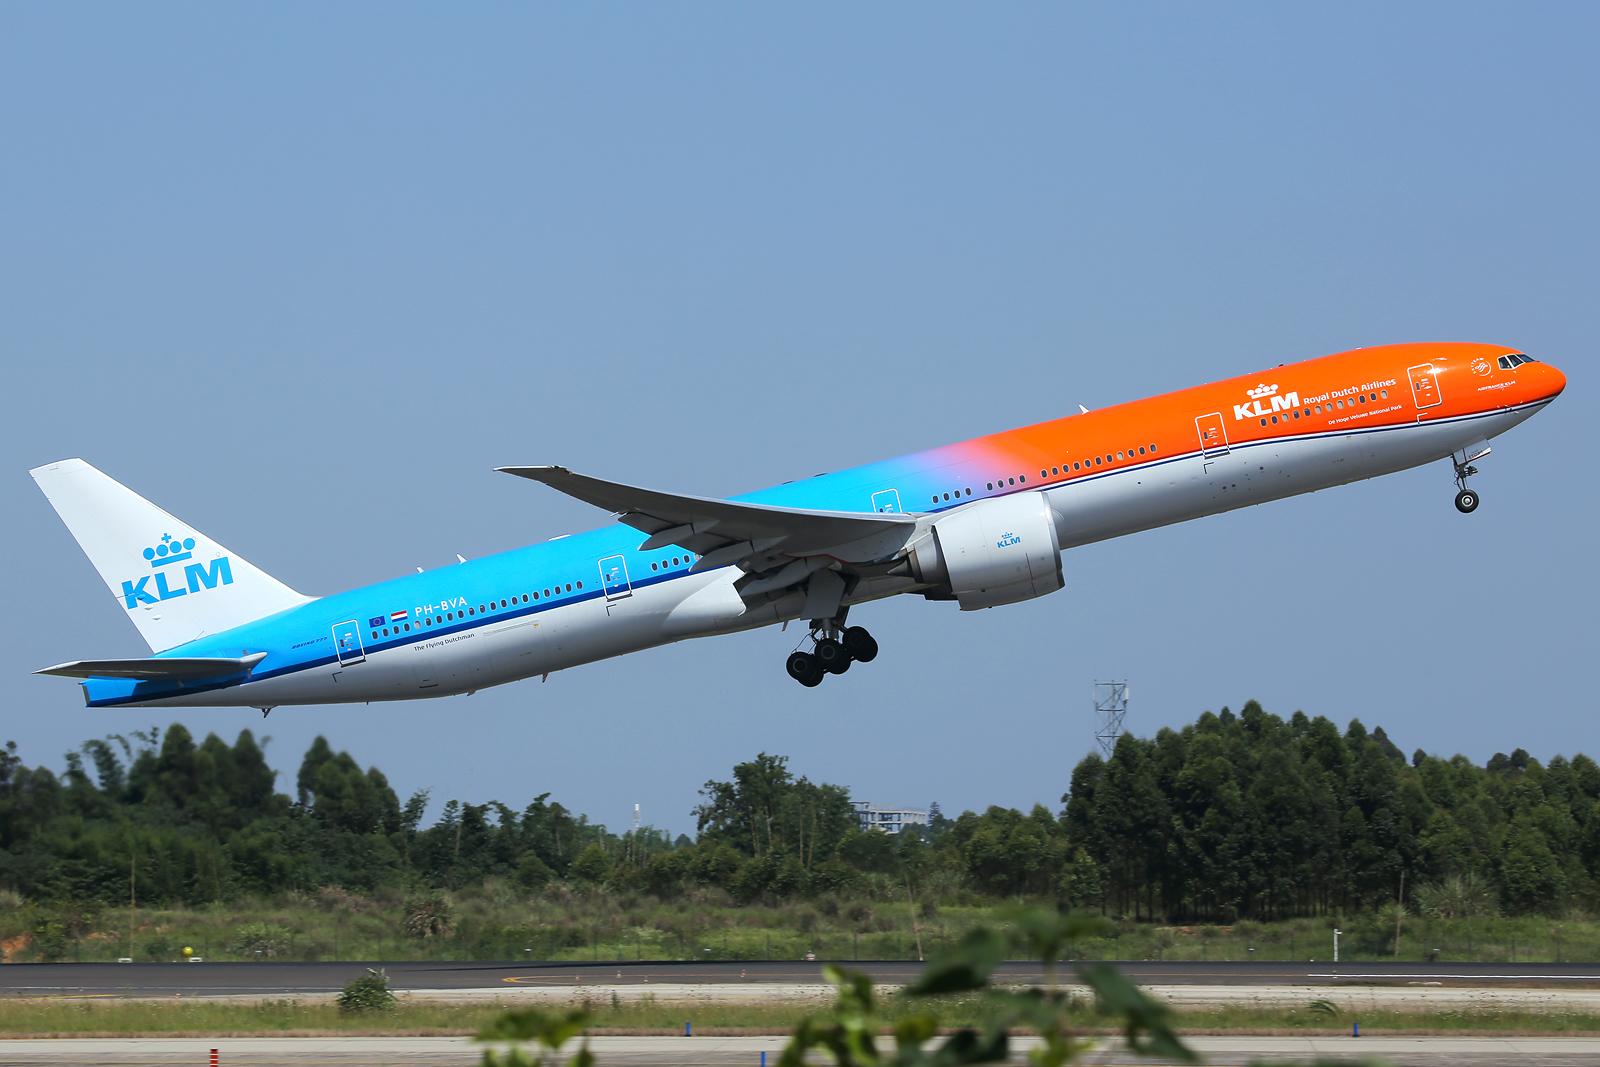 Re:[原创][CCFA] CTU 成都六月绝对的惊喜,KLM荷兰皇家航空Orange Pride首次亲吻成都!!!!!!! BOEING 777-300ER PH-BVA 中国成都双流国际机场